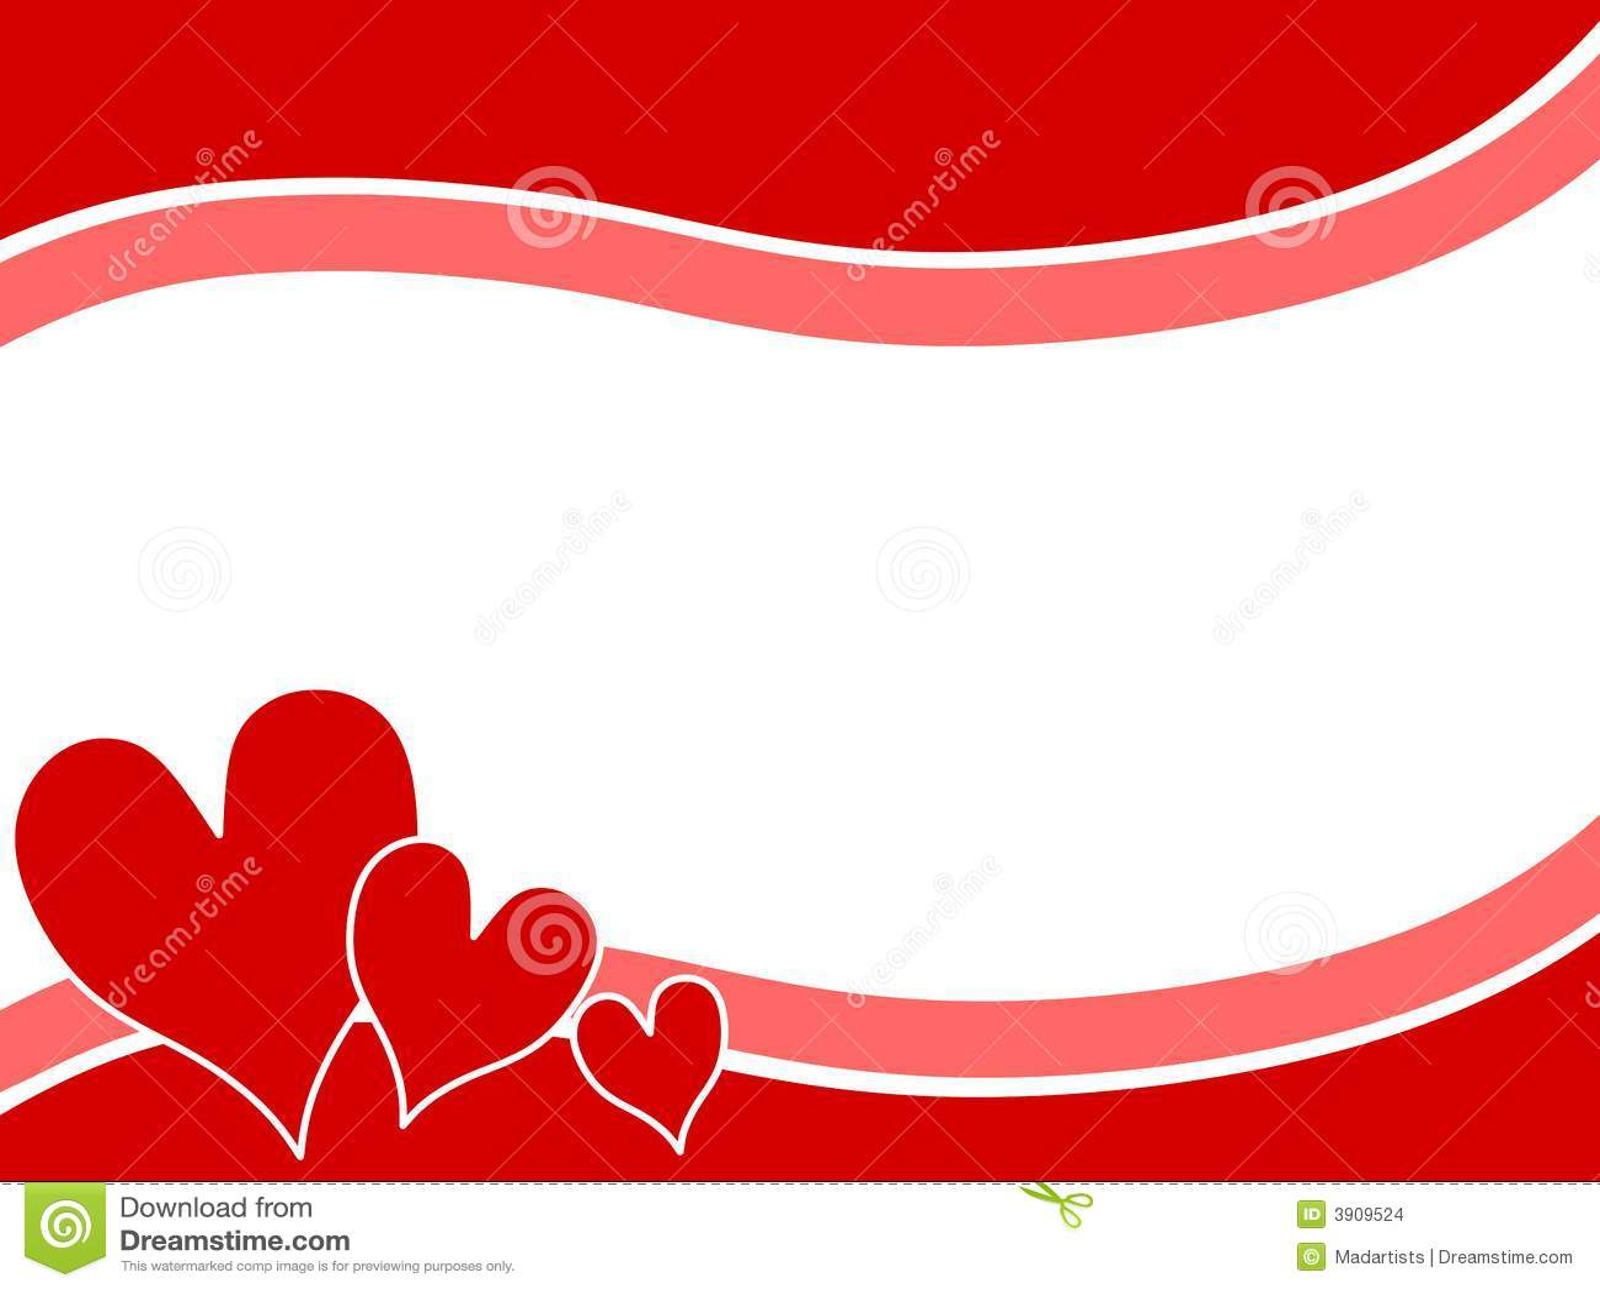 Swoosh Valentine Hearts Border Background 2 Stock Images